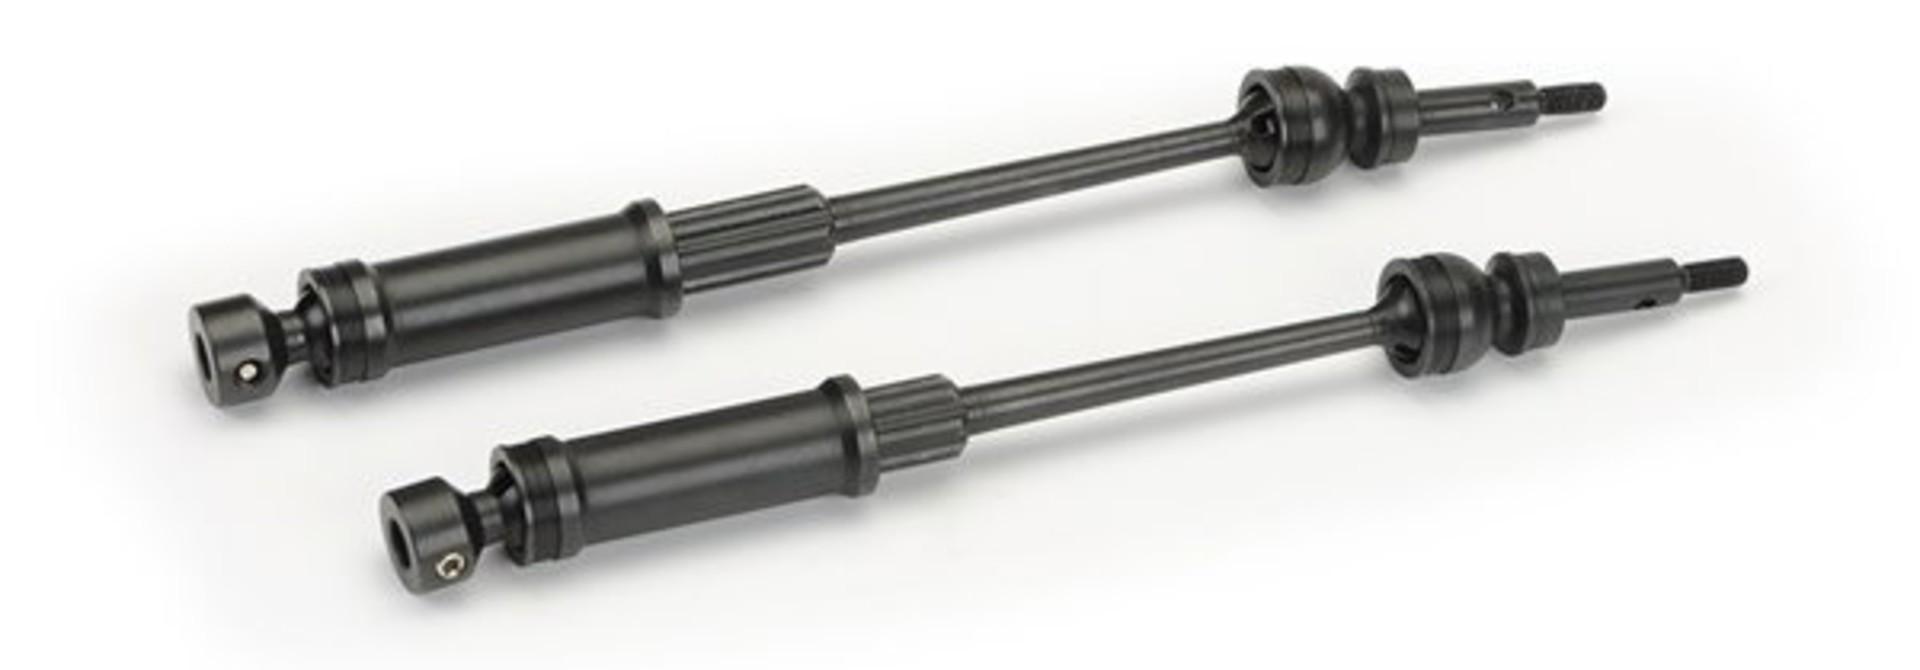 Assembled Front or Rear Pro-Spline HD Axles for E-REVO & SUM